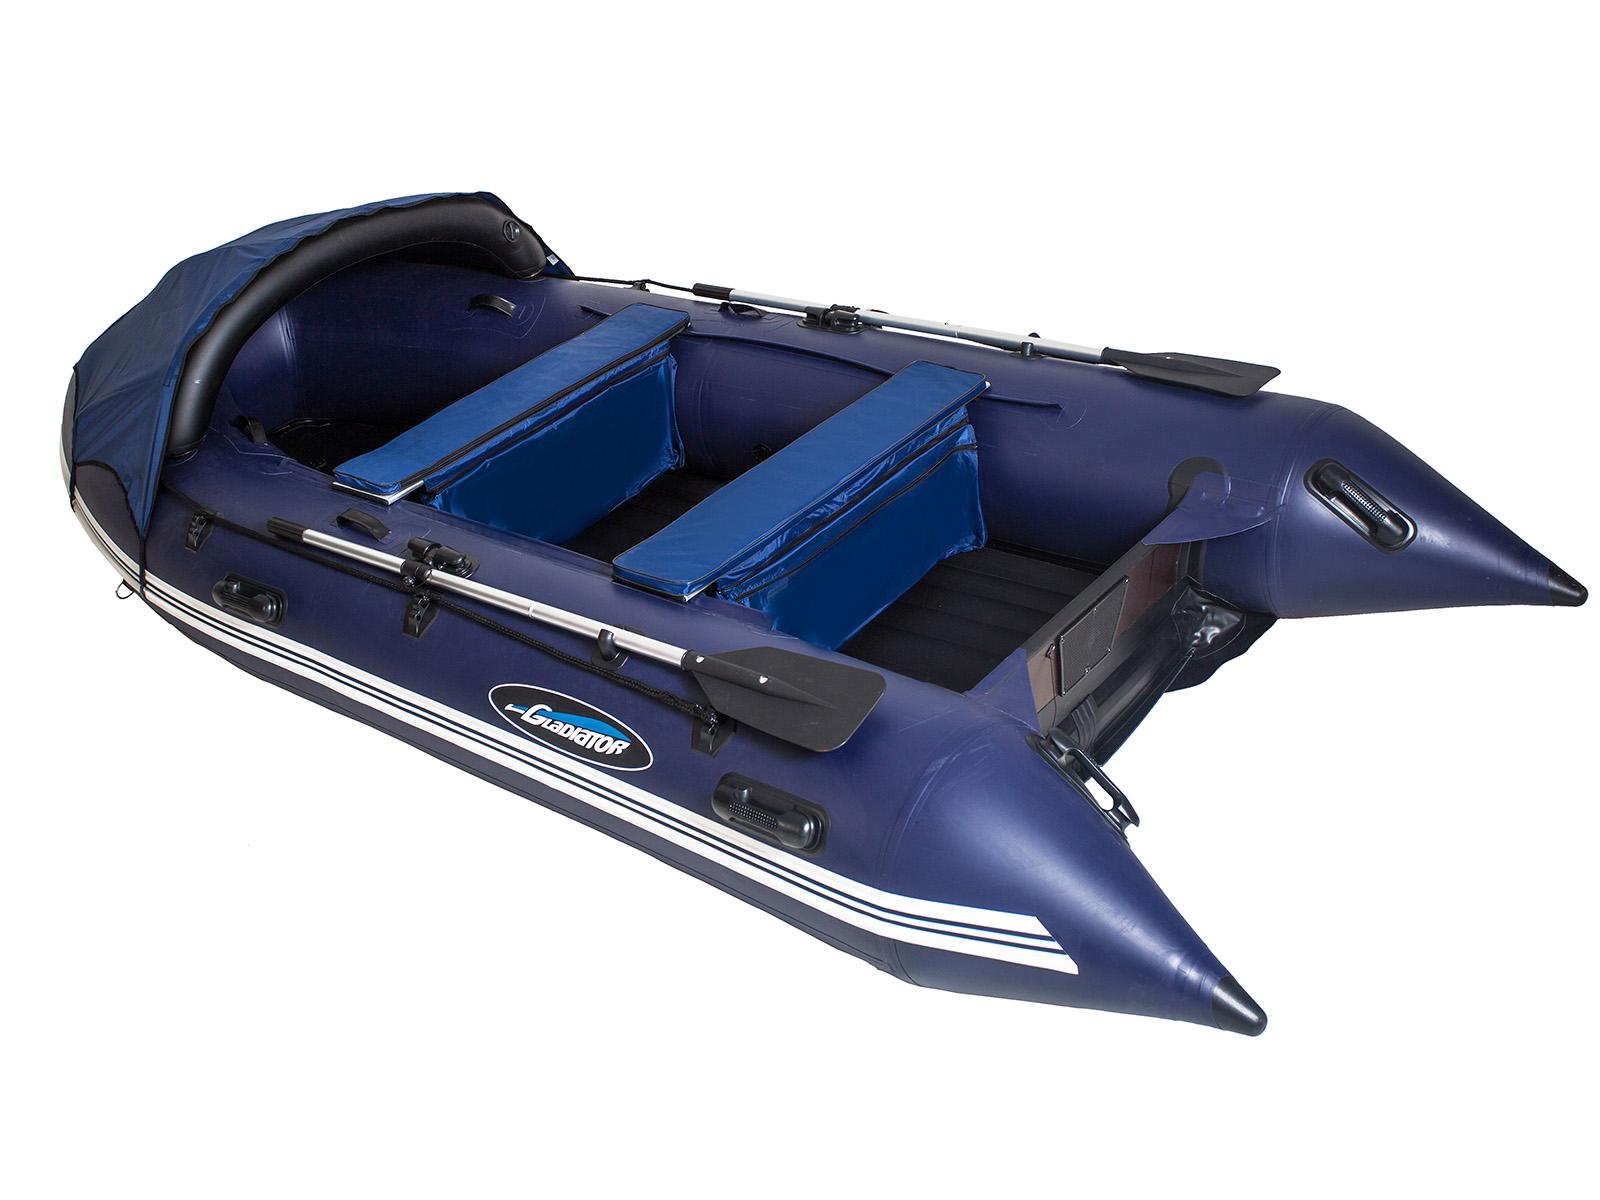 Лодка надувная Gladiator E 450 НДНД 4,5 x 2,04 м